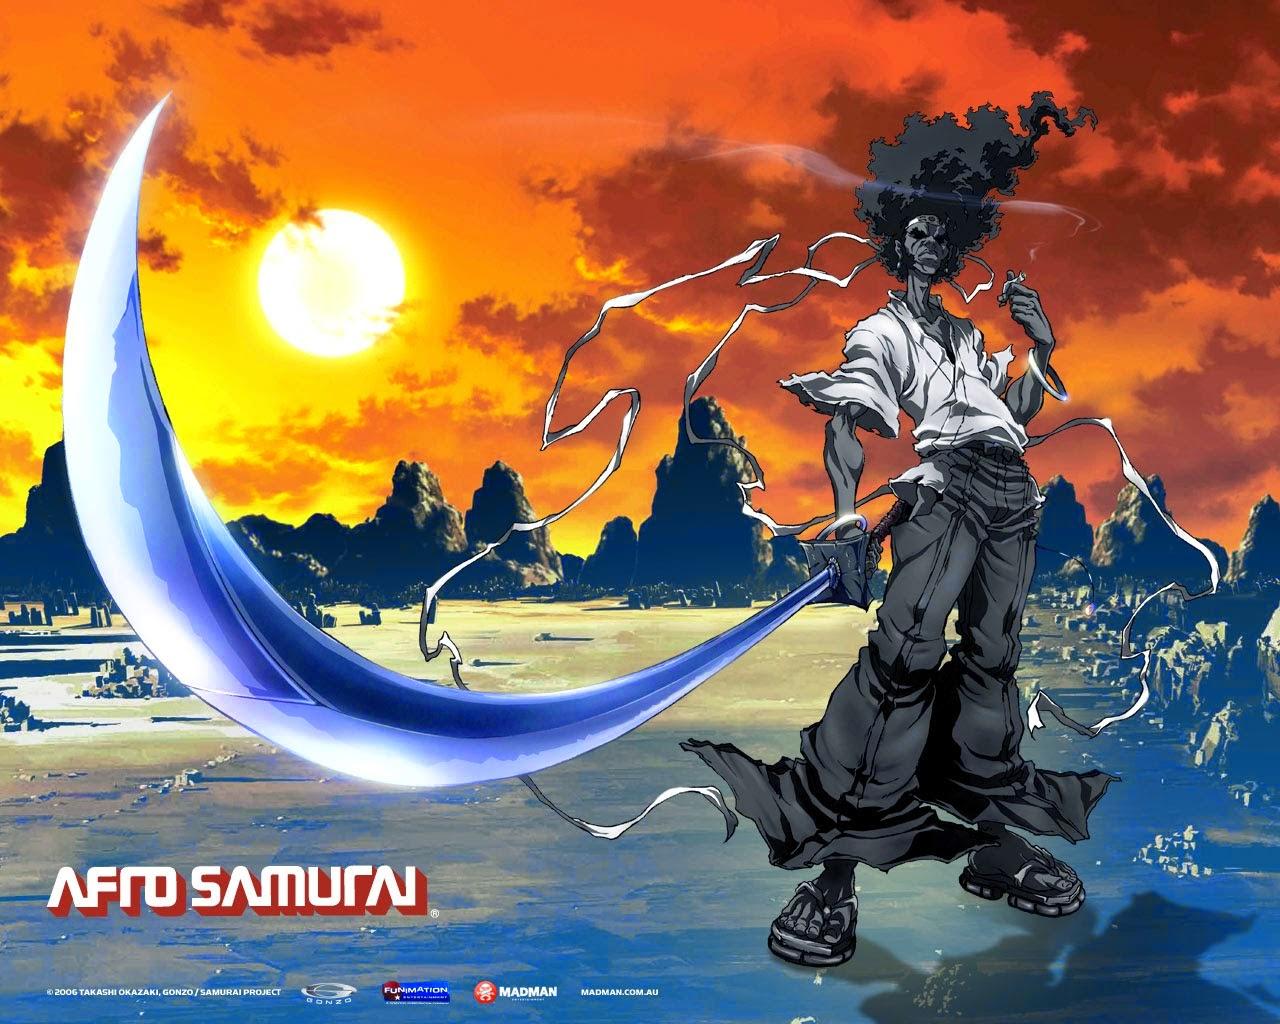 anime para todos: Afro Samurai アフロサムライ the movie